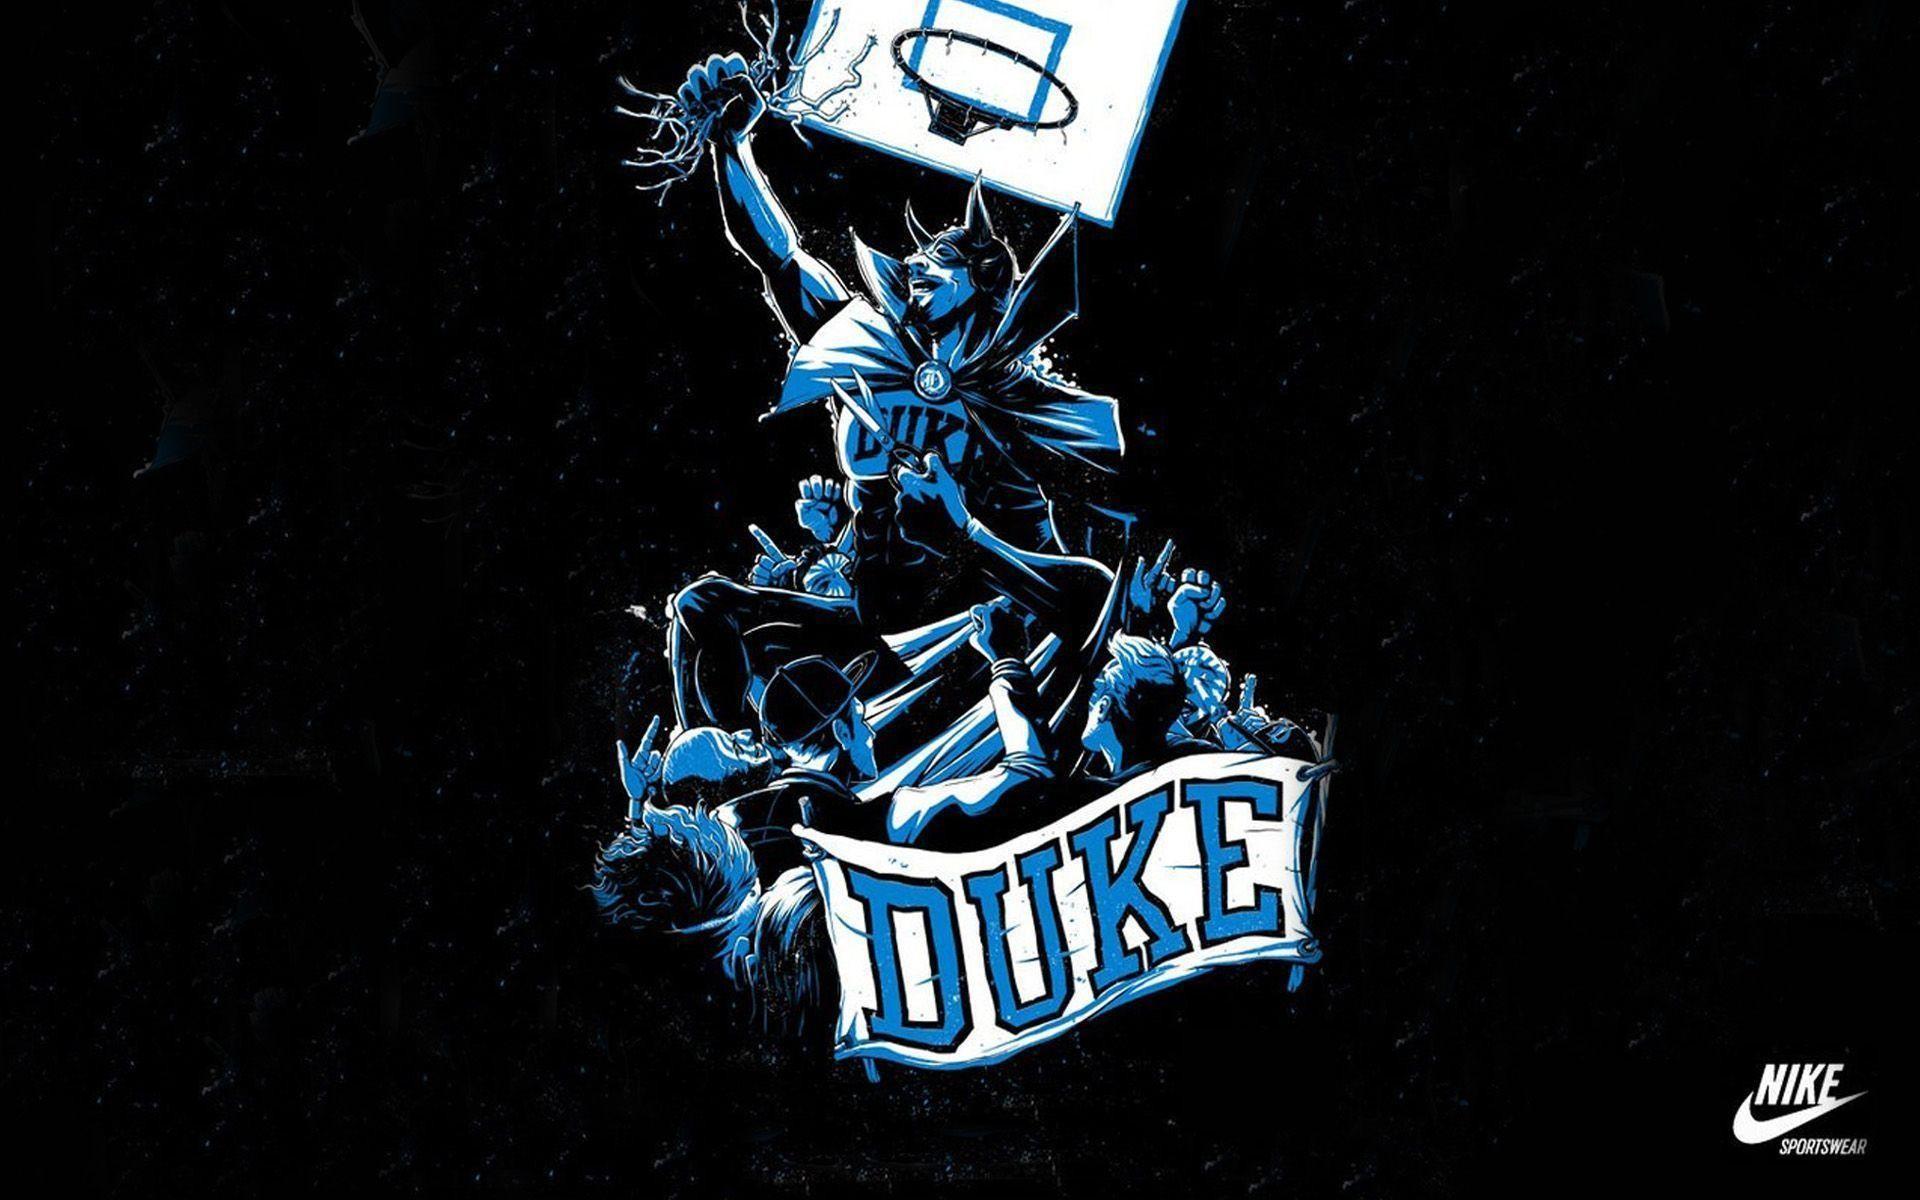 Duke Basketball Nike Logo wallpaper HD 2016 in Basketball .